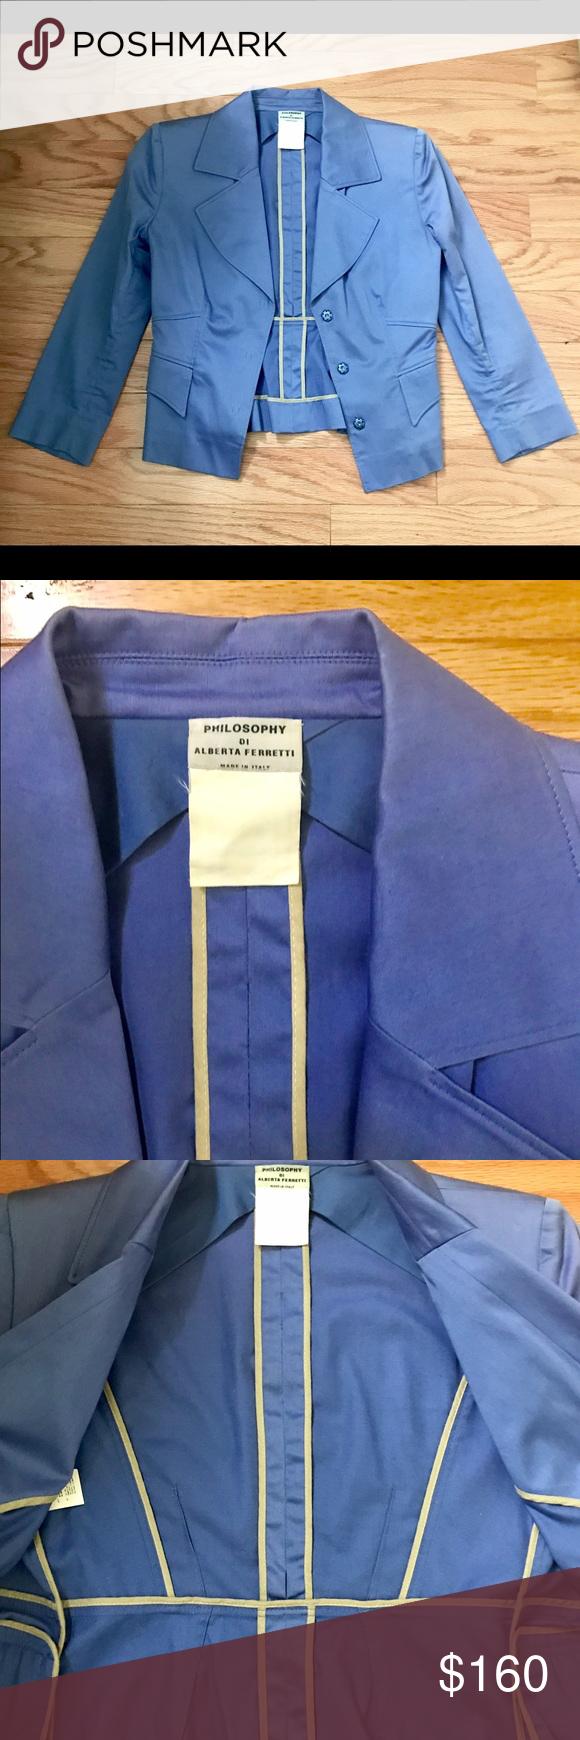 100% Authentic Alberta Ferretti ocean blue jacket 100% Authentic made in Italy Alberta Ferretti ocean blue jacket, used very good condition Philosophy di Alberta Ferretti Jackets & Coats Blazers